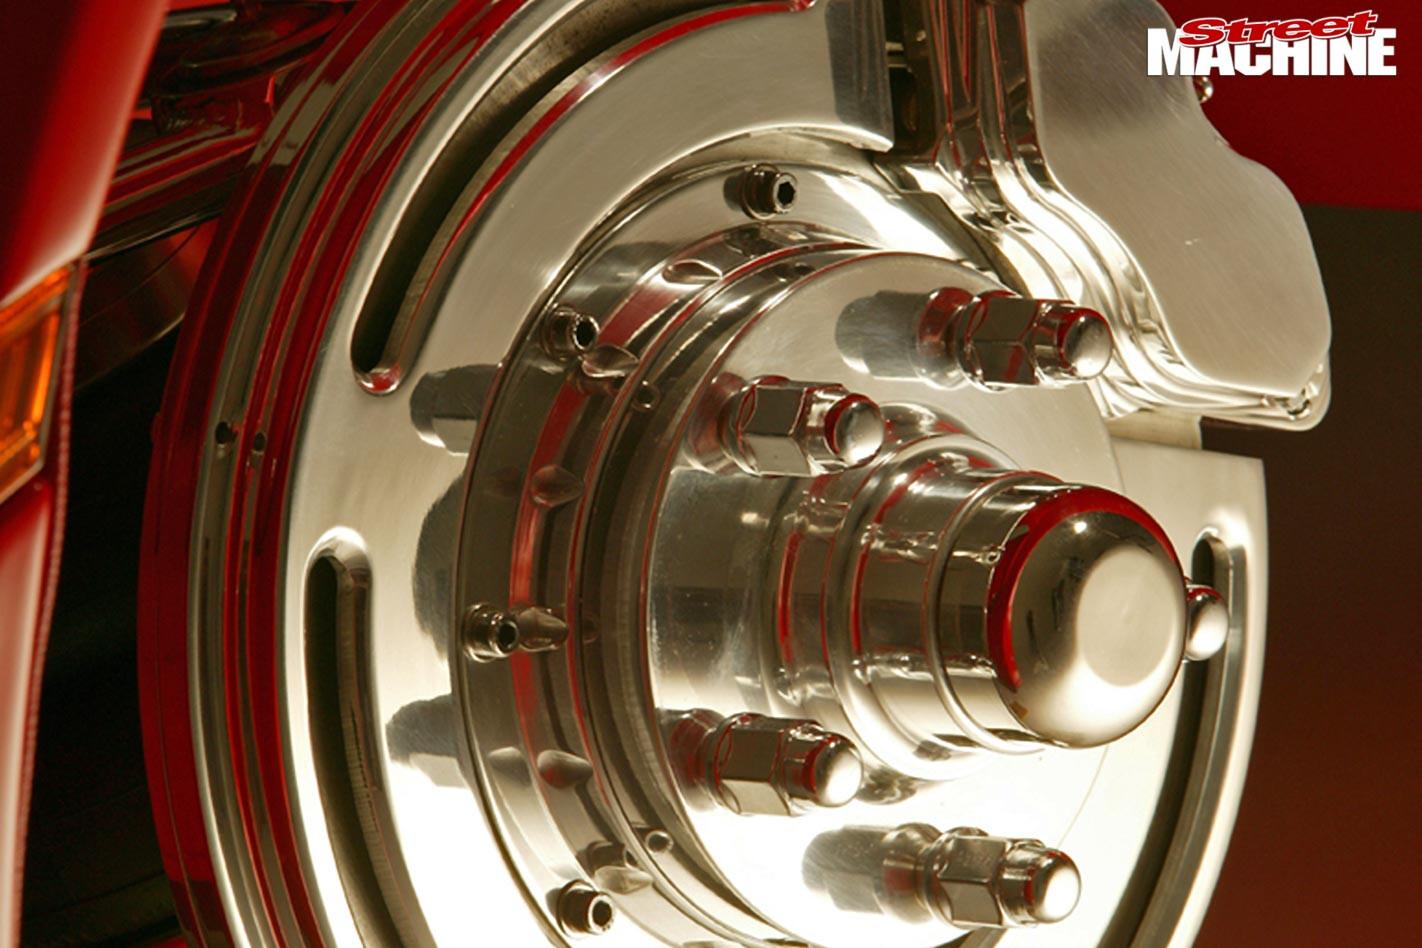 Mitsubishi Magna brakes